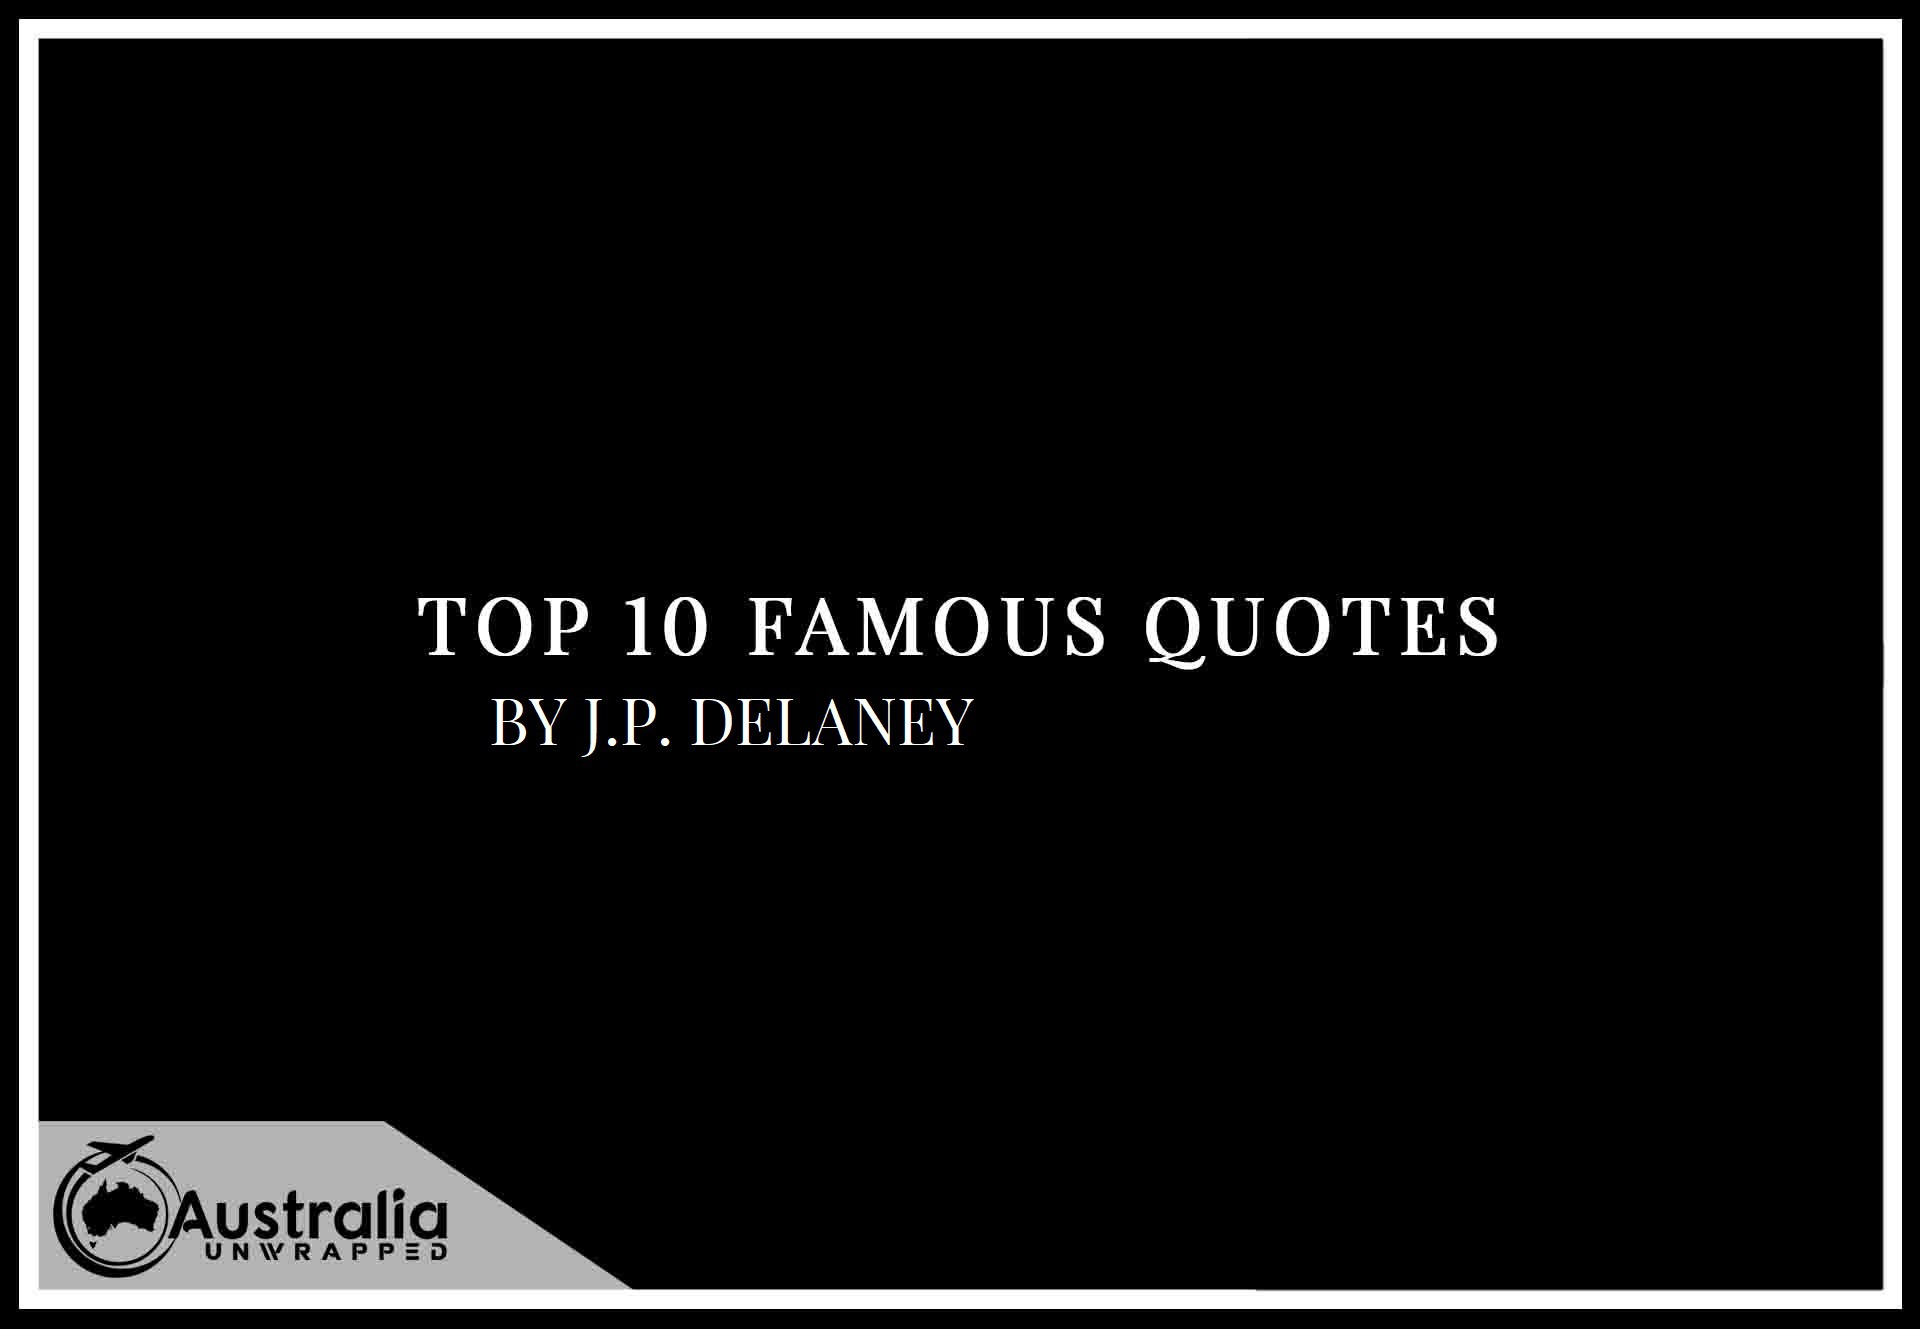 Top 10 Famous Quotes by Author J.P. Delaney